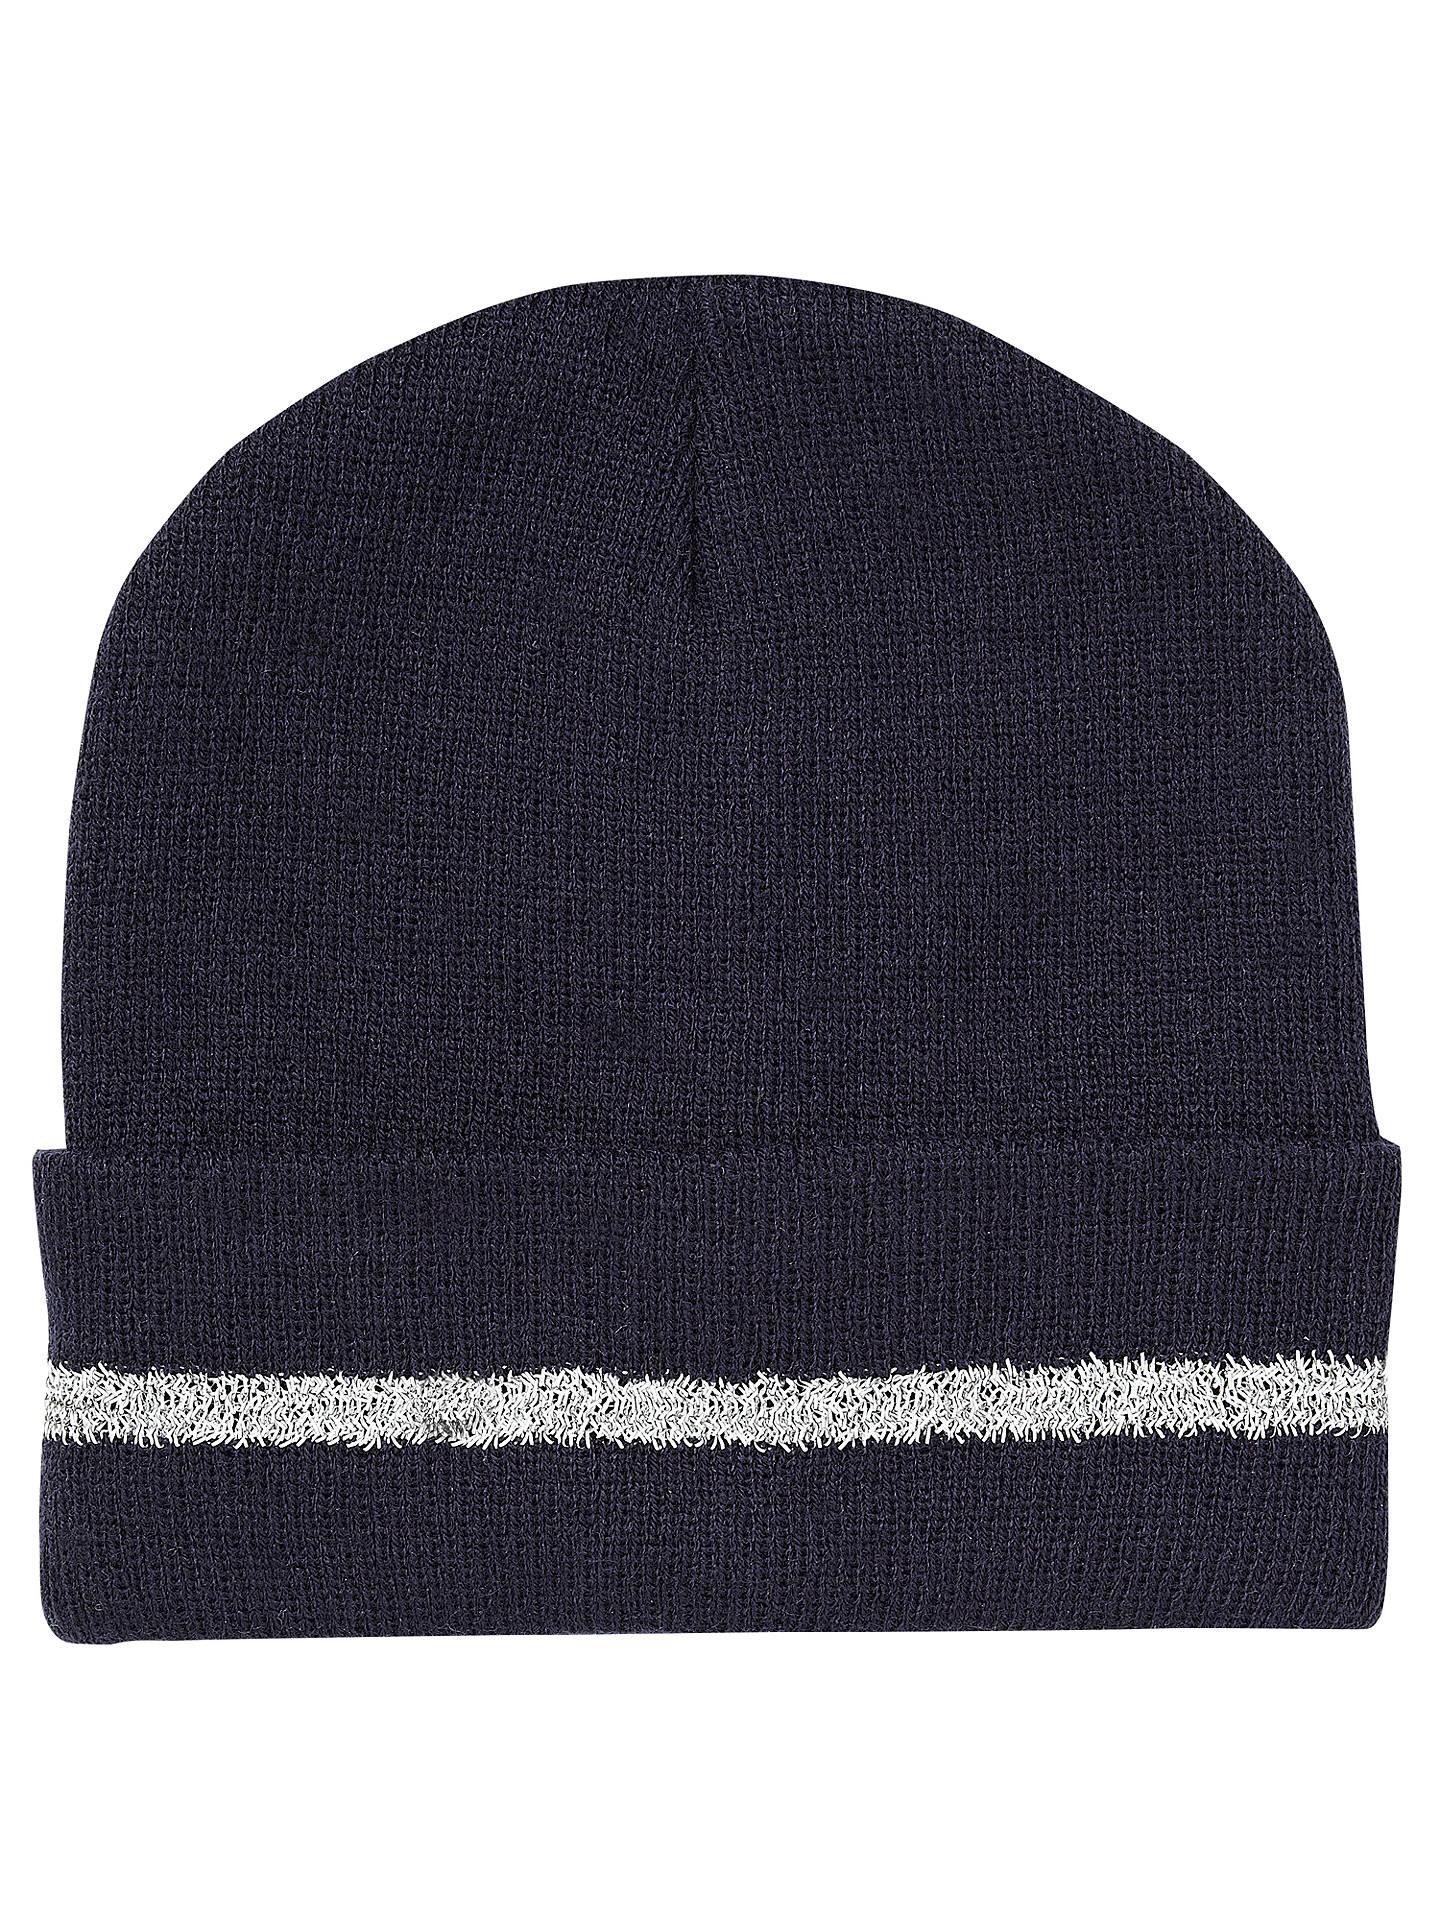 a45ef2d43df Buy School Unisex High Visibility Ski Hat